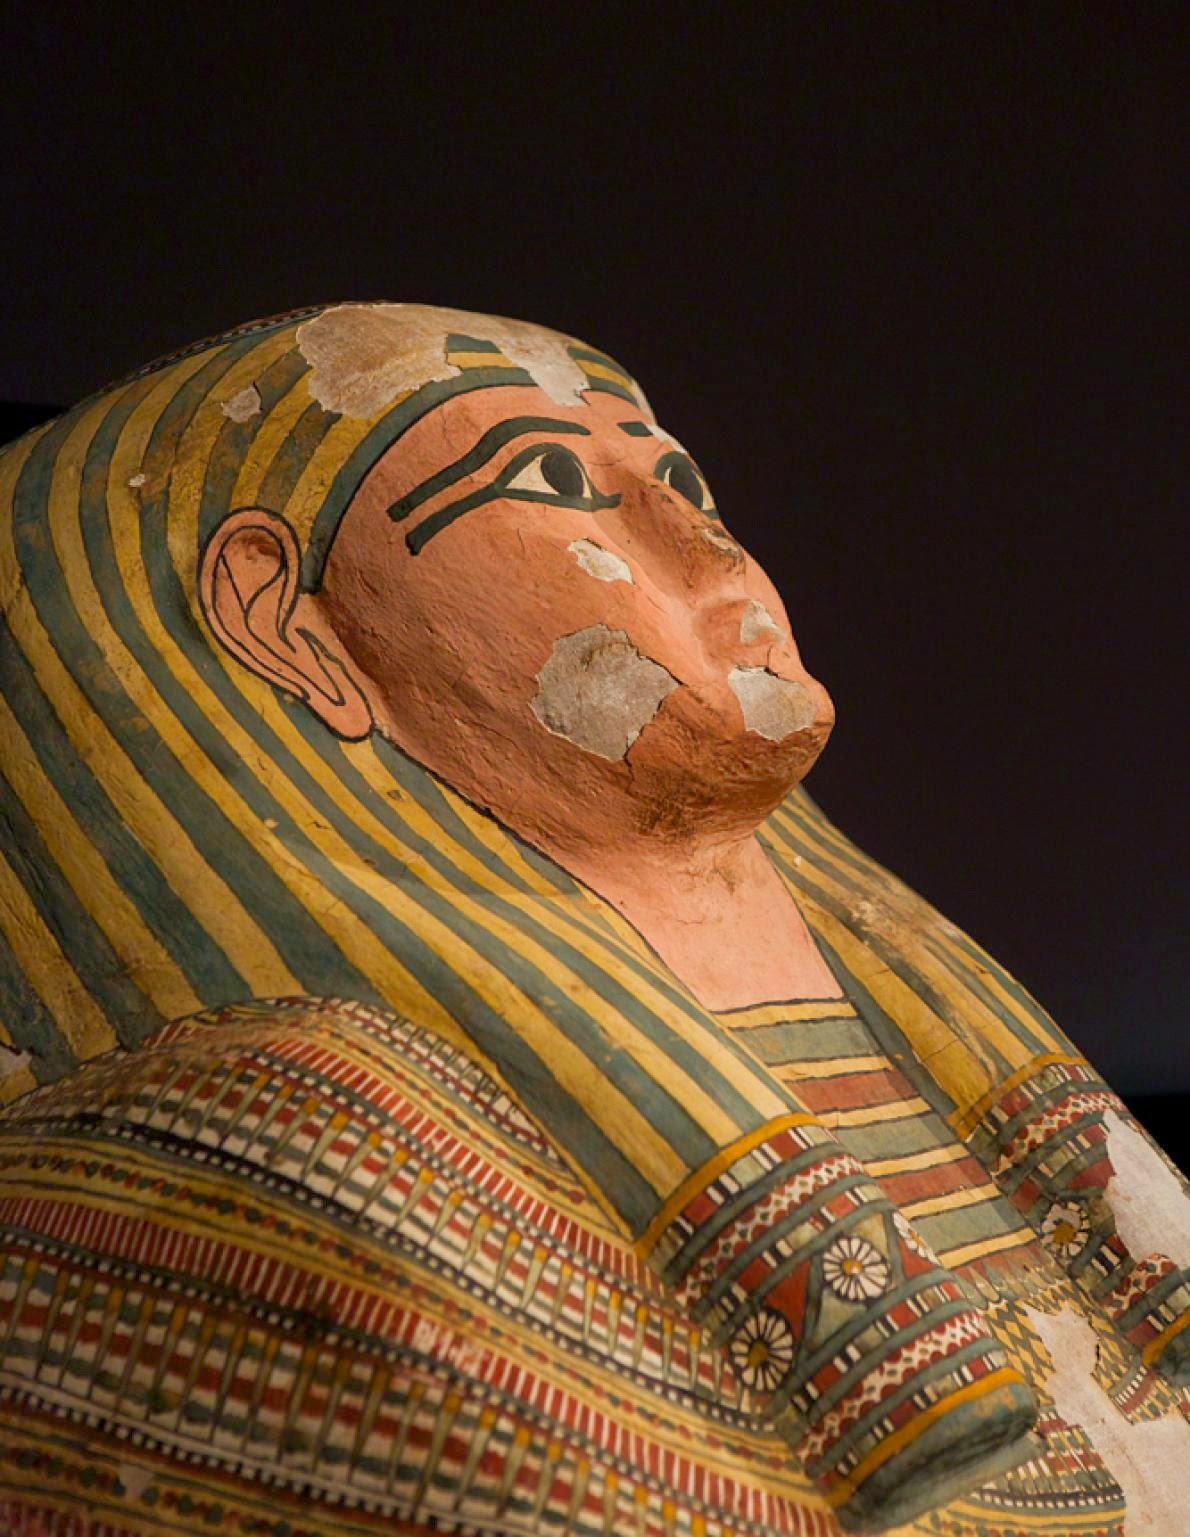 Khentiamentiu: Ancient Egyptian Artifacts Smuggled Into U